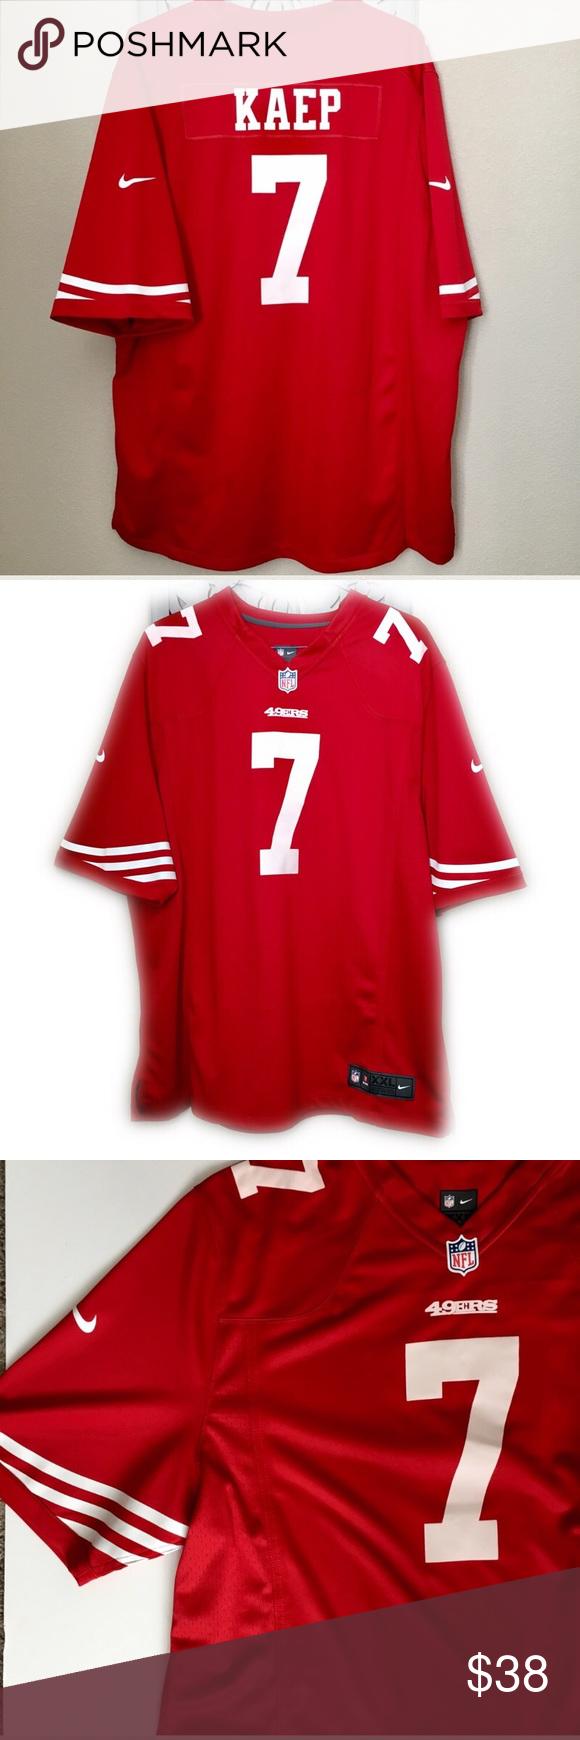 quality design 38e8d 569c1 San Francisco 49ers Colin Kaepernick #7 Jersey San Francisco ...